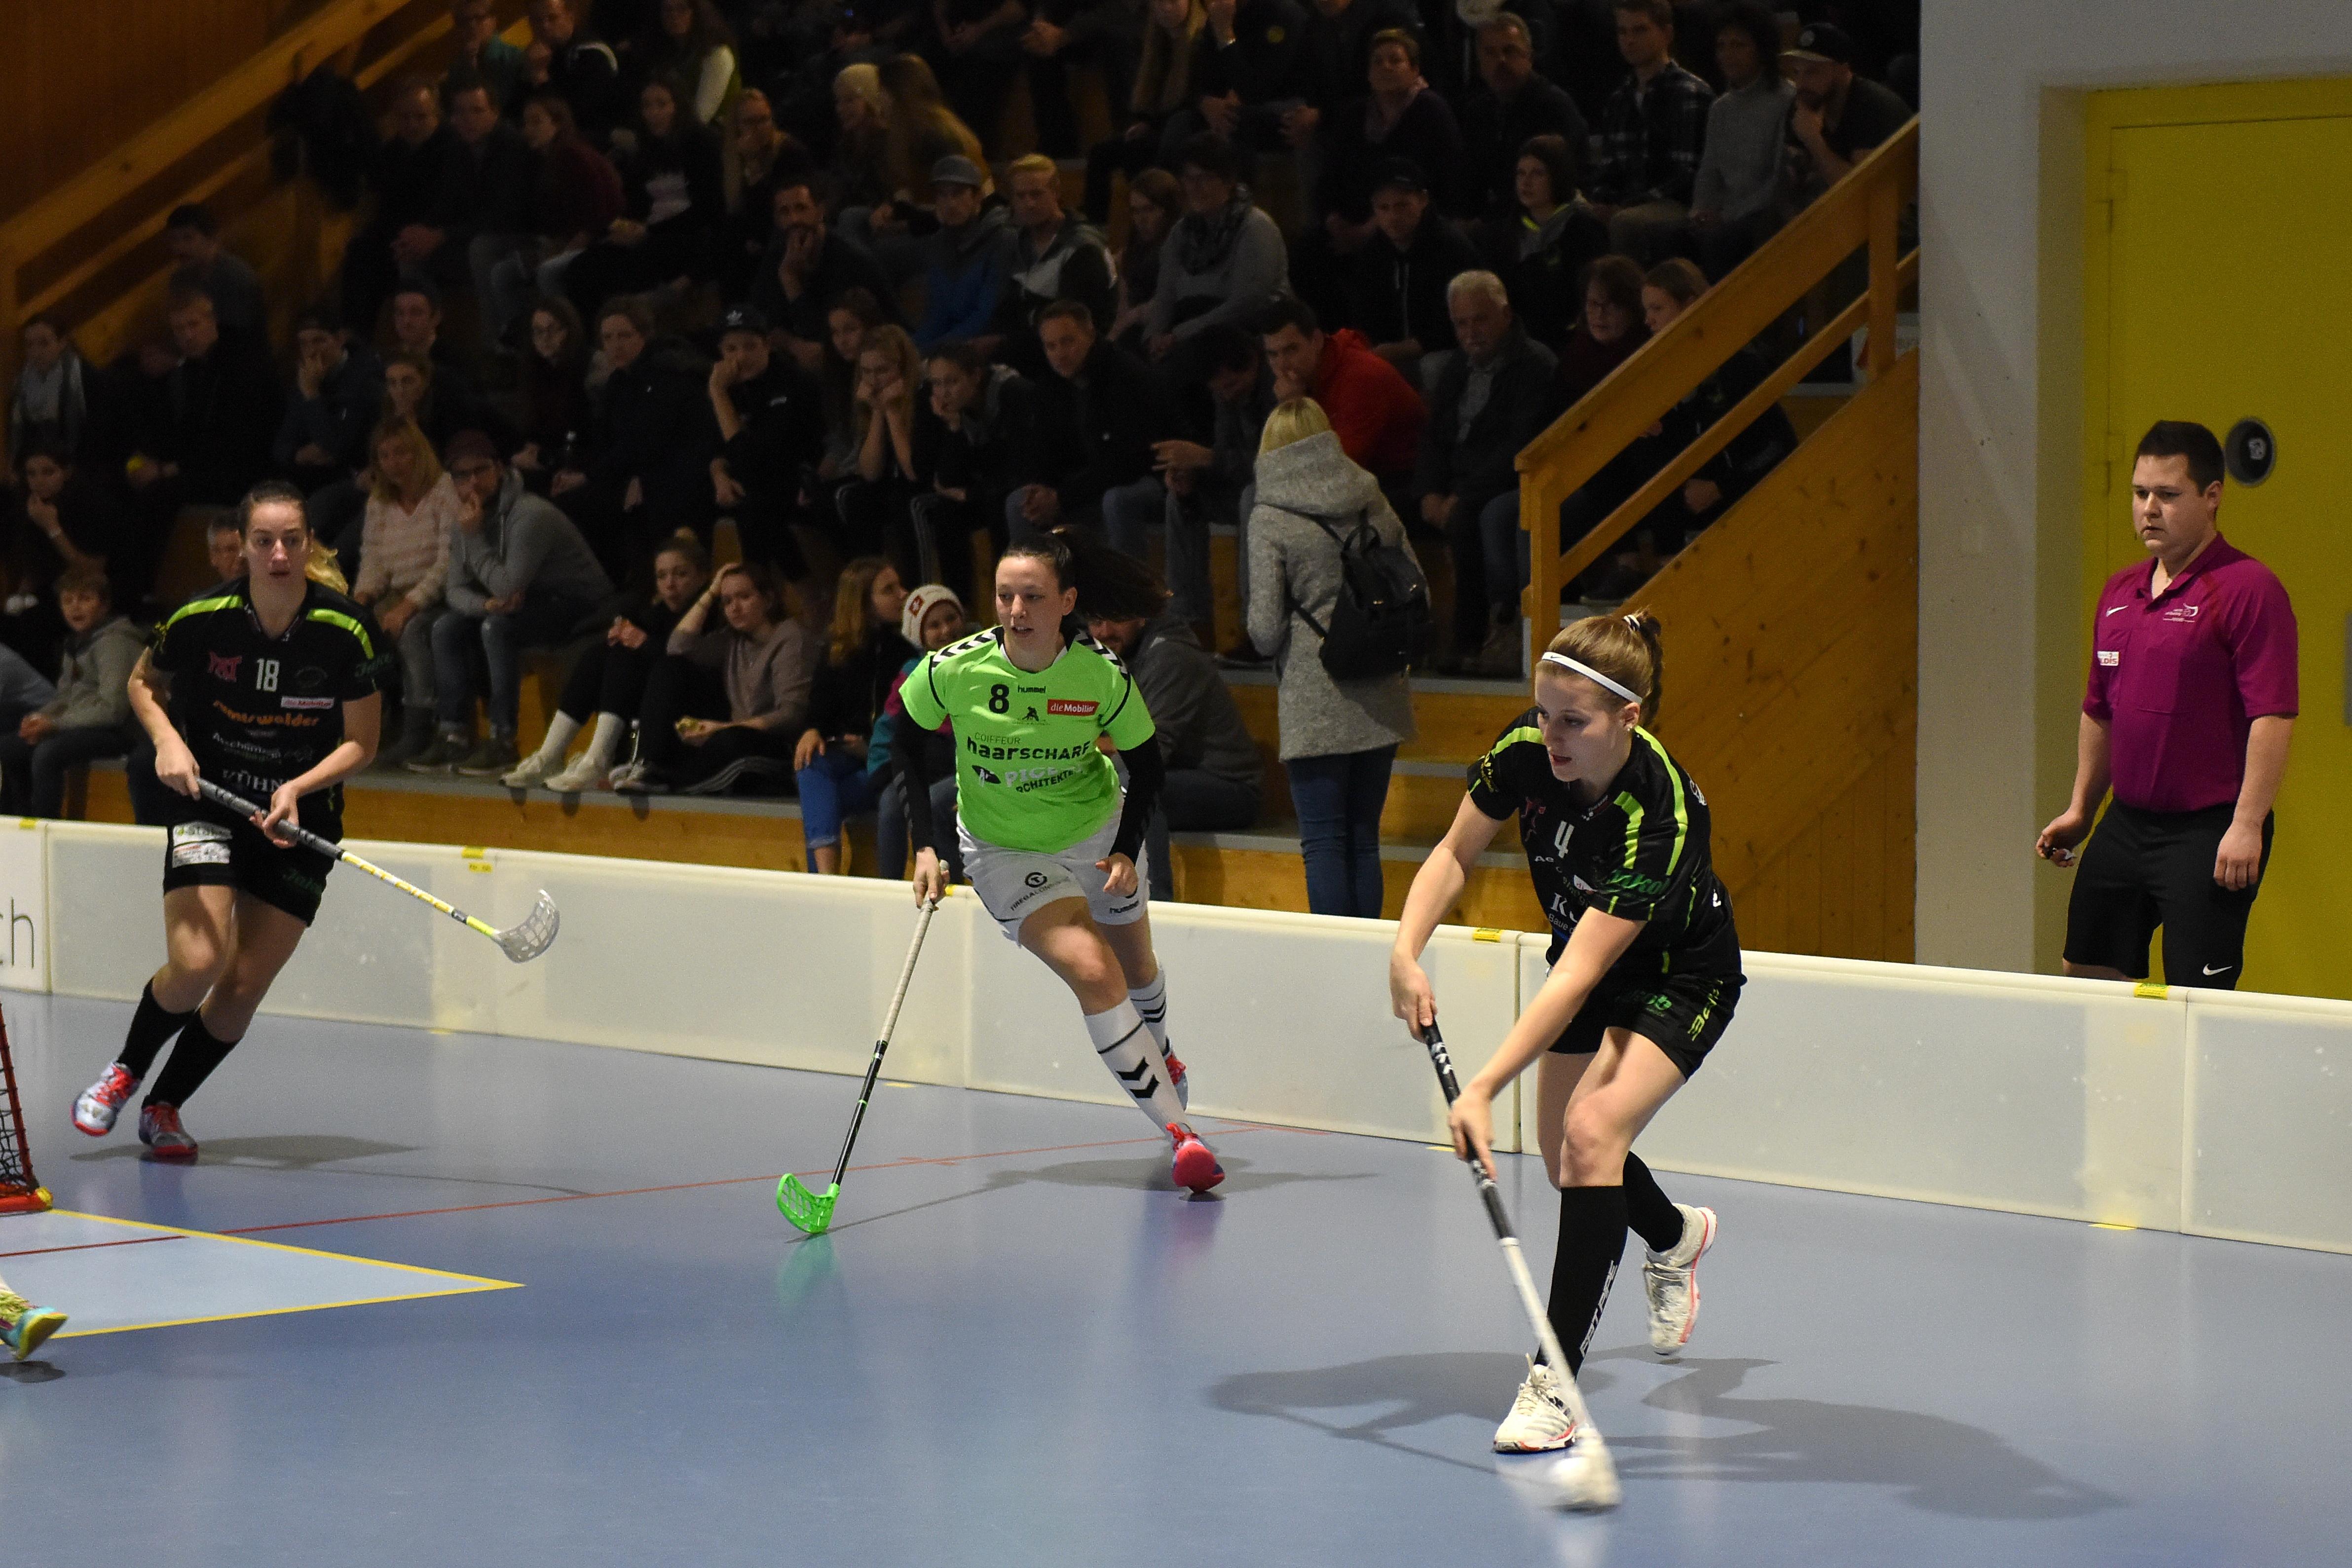 2018.12.16 NLA vs. Laupen